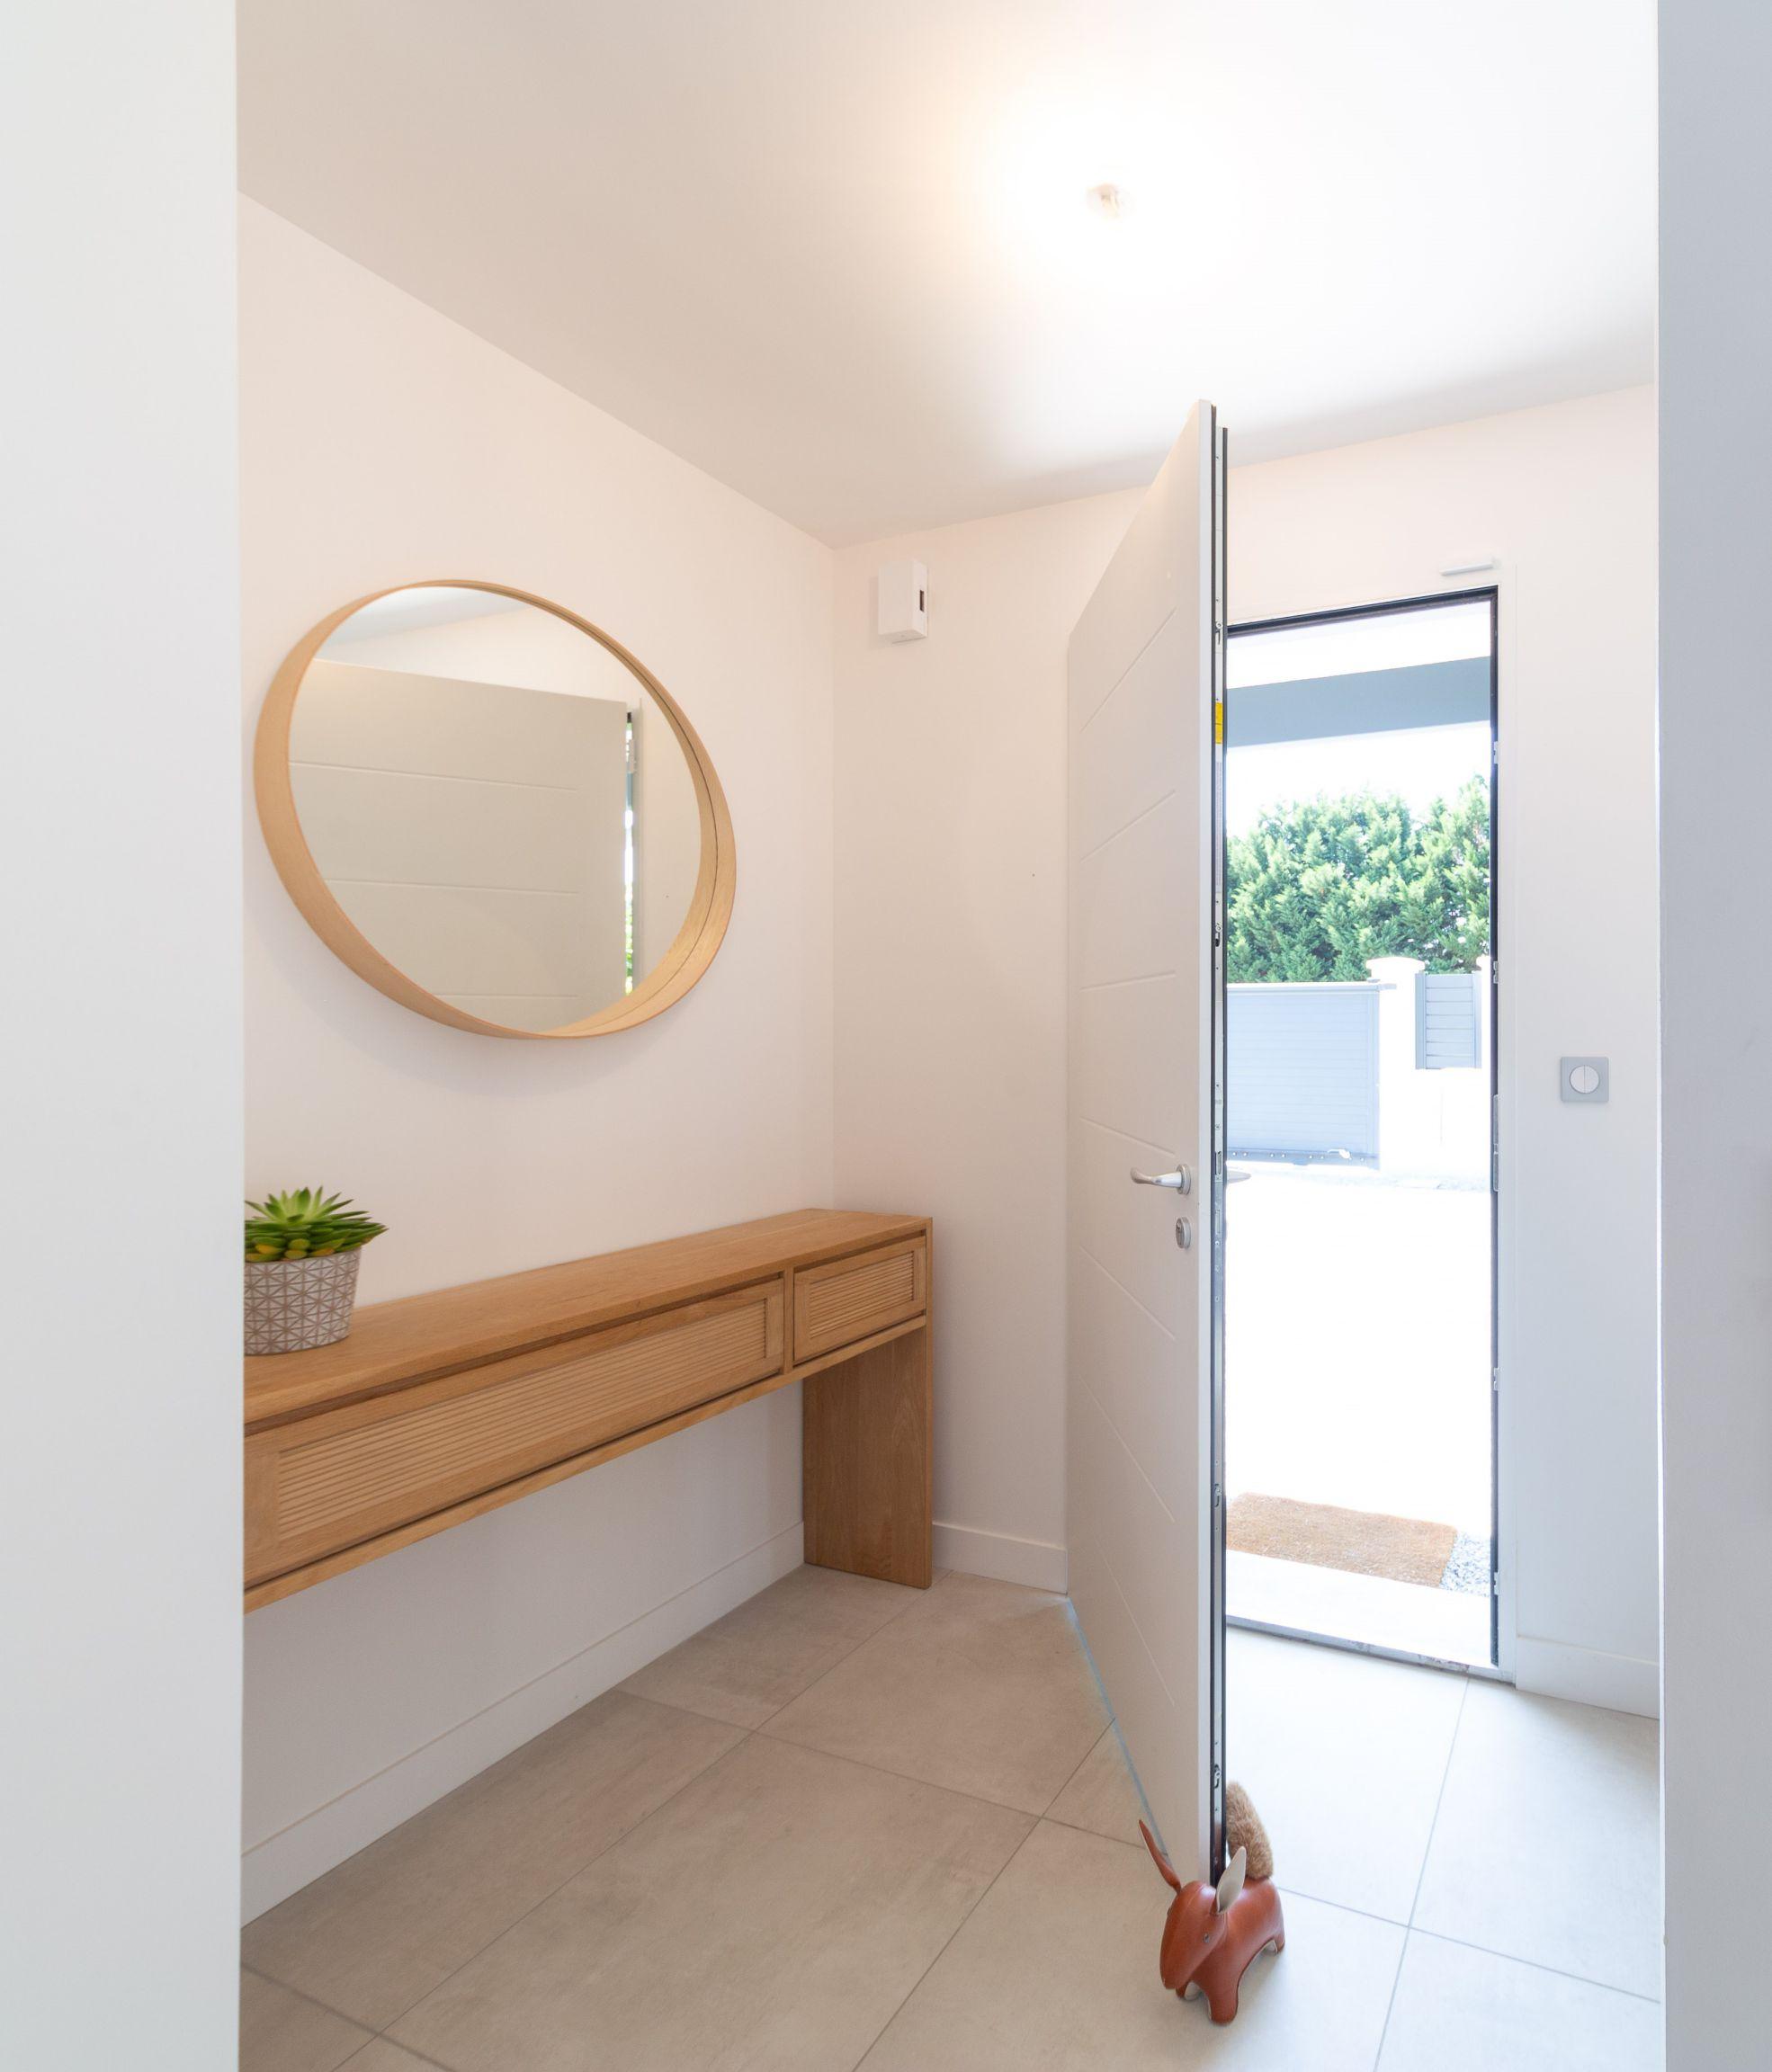 hall d'entrée avec miroir